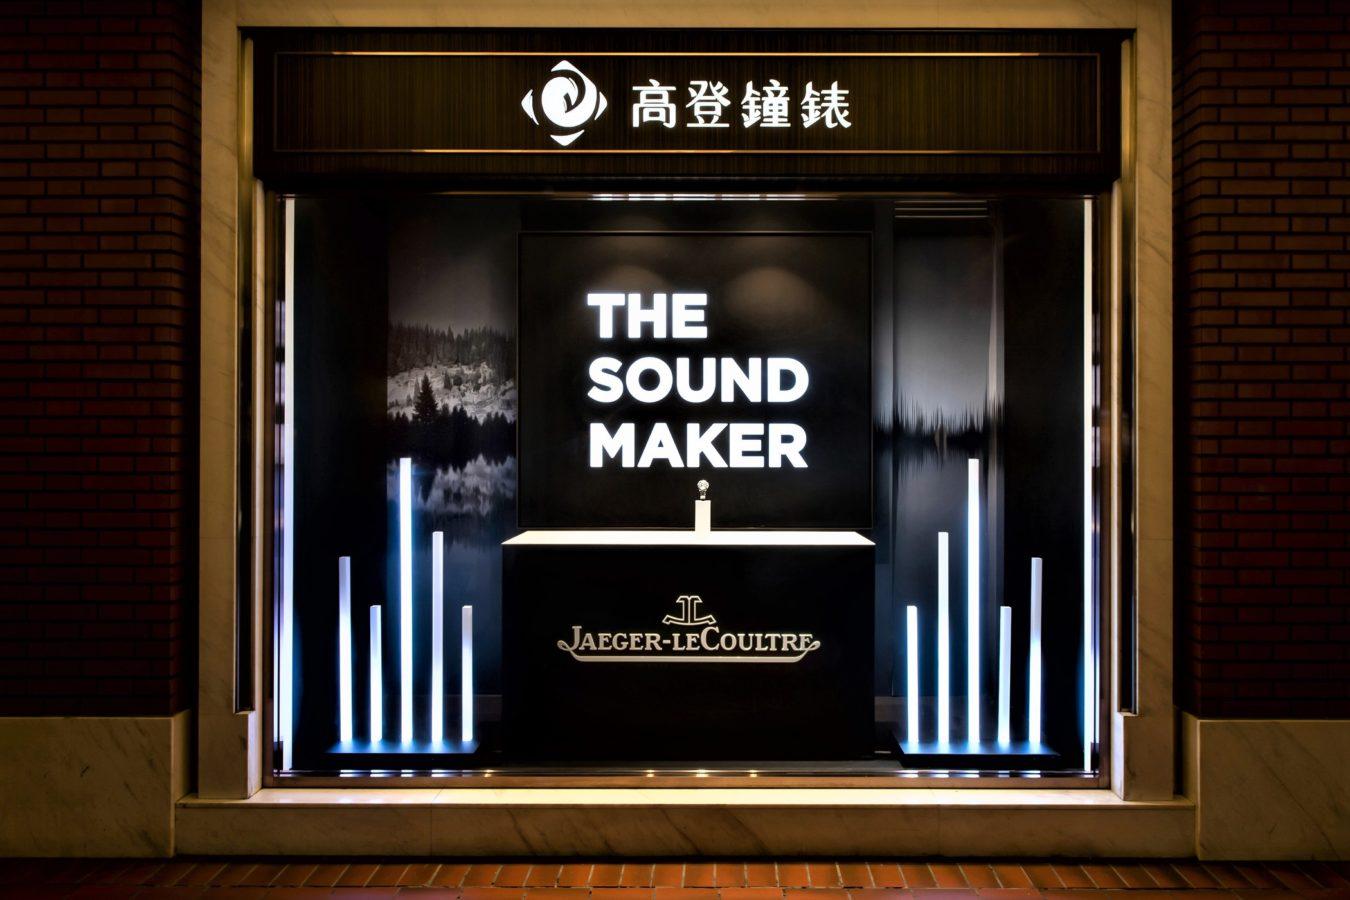 THE SOUND MAKER工藝美學藏家驚嘆 Jaeger-LeCoultre腕錶大展靠岸台灣